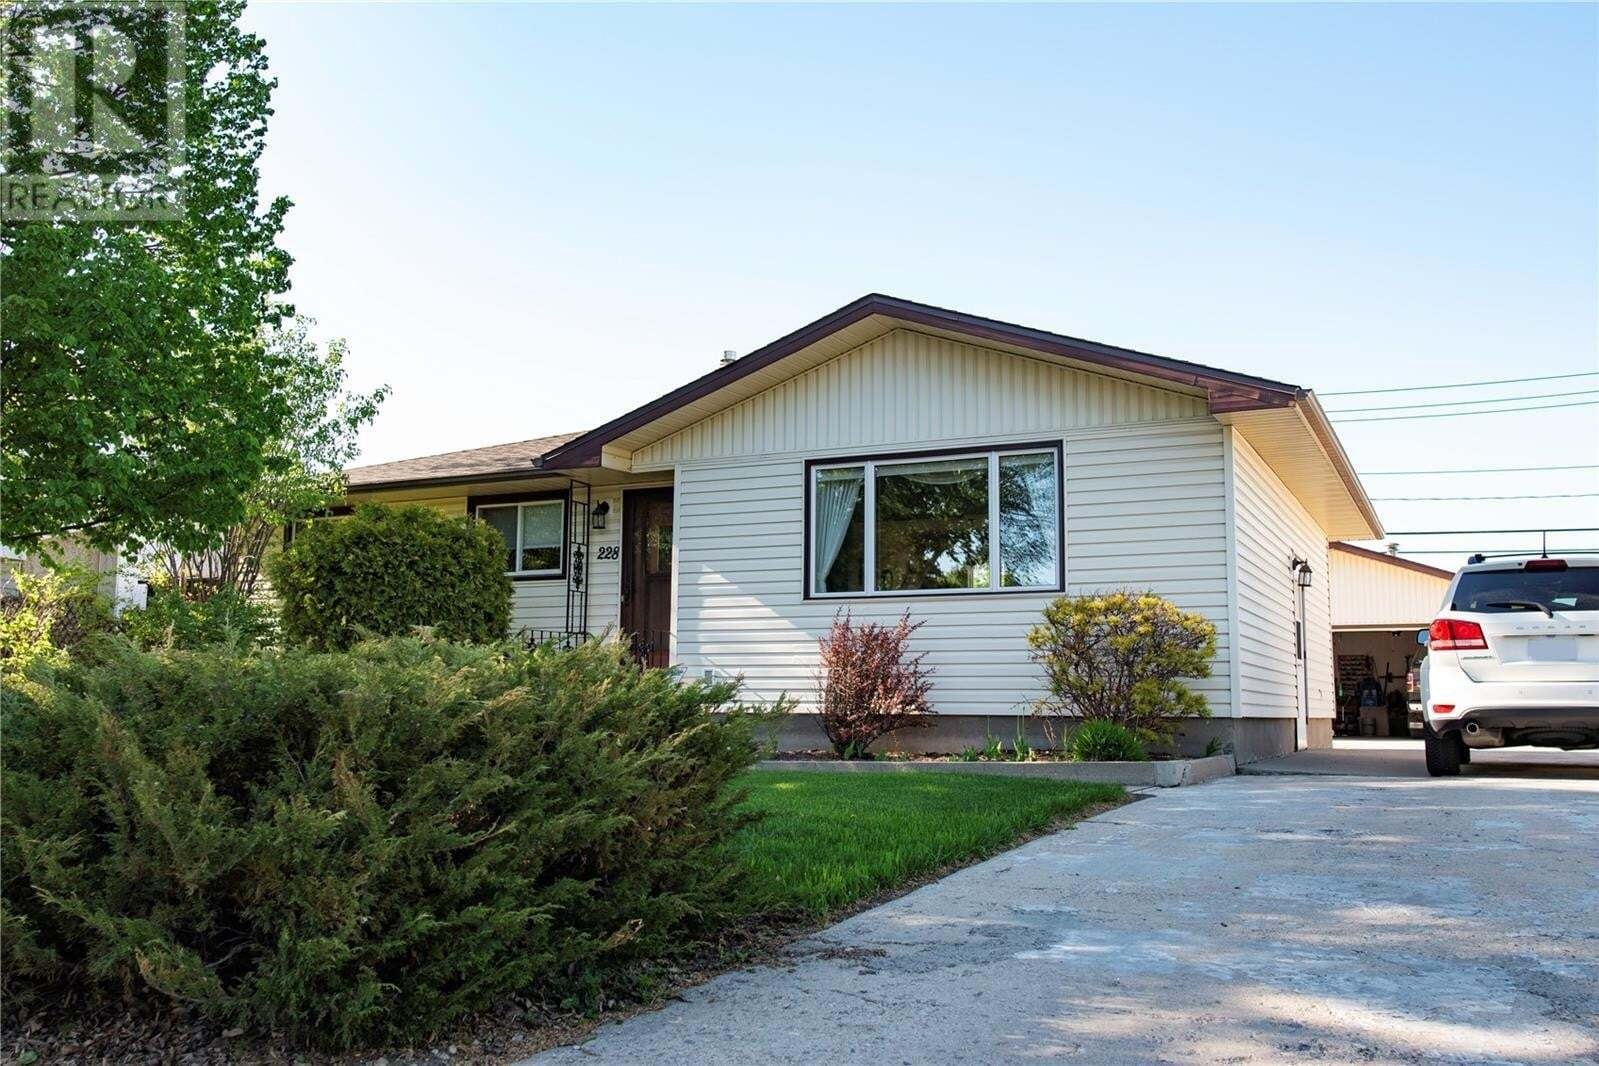 House for sale at 228 Coldwell Rd Regina Saskatchewan - MLS: SK810224